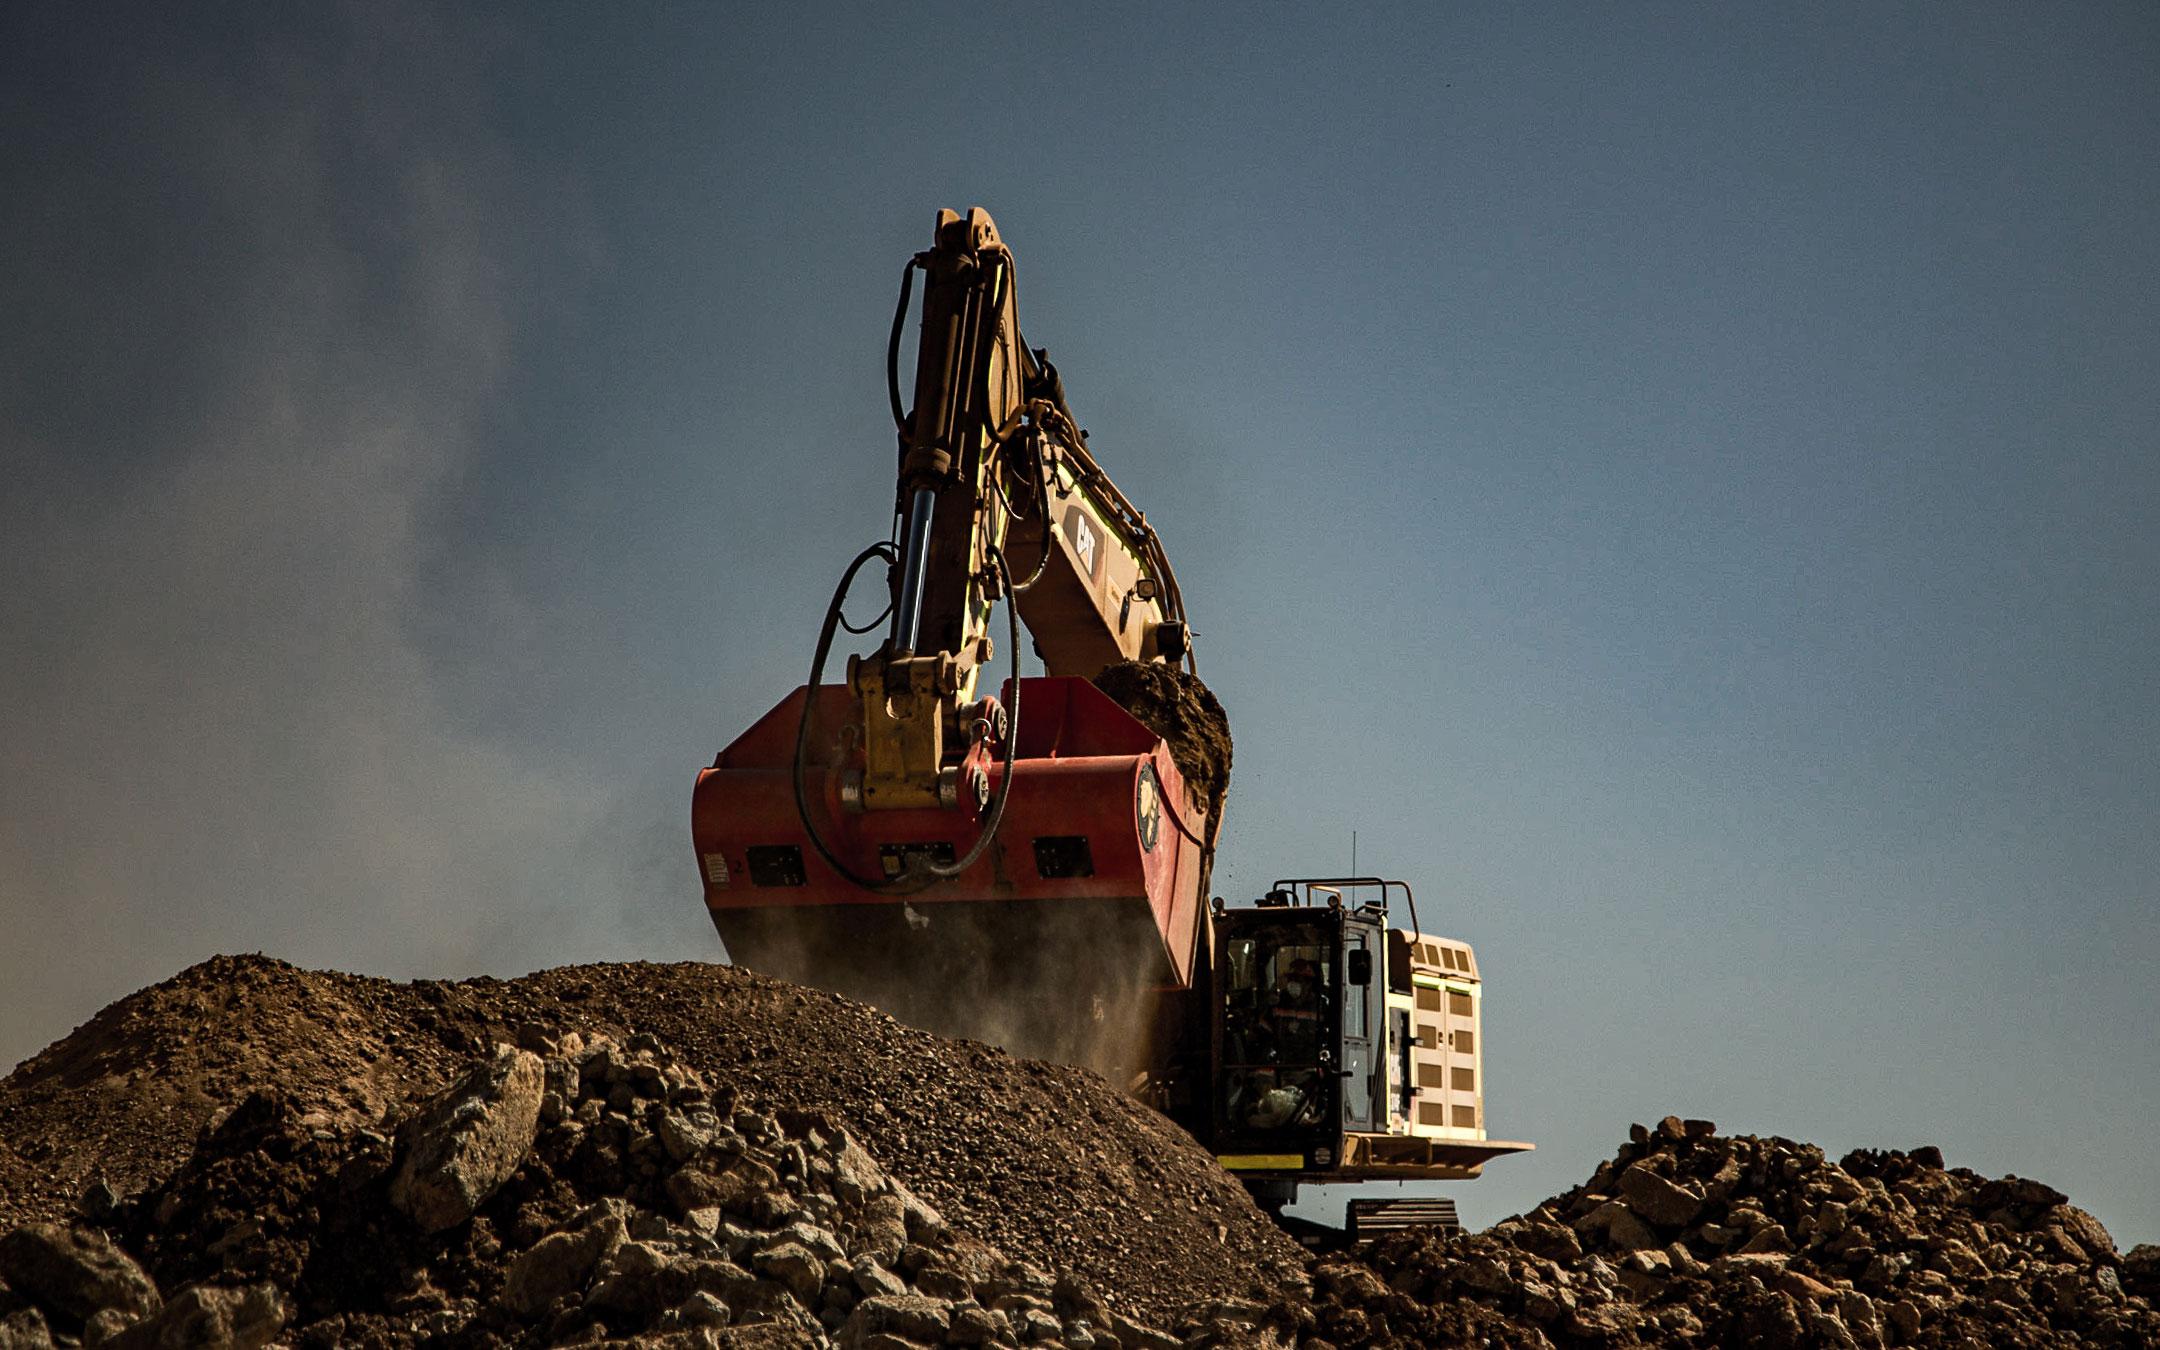 fotografia industrial mineracao 14